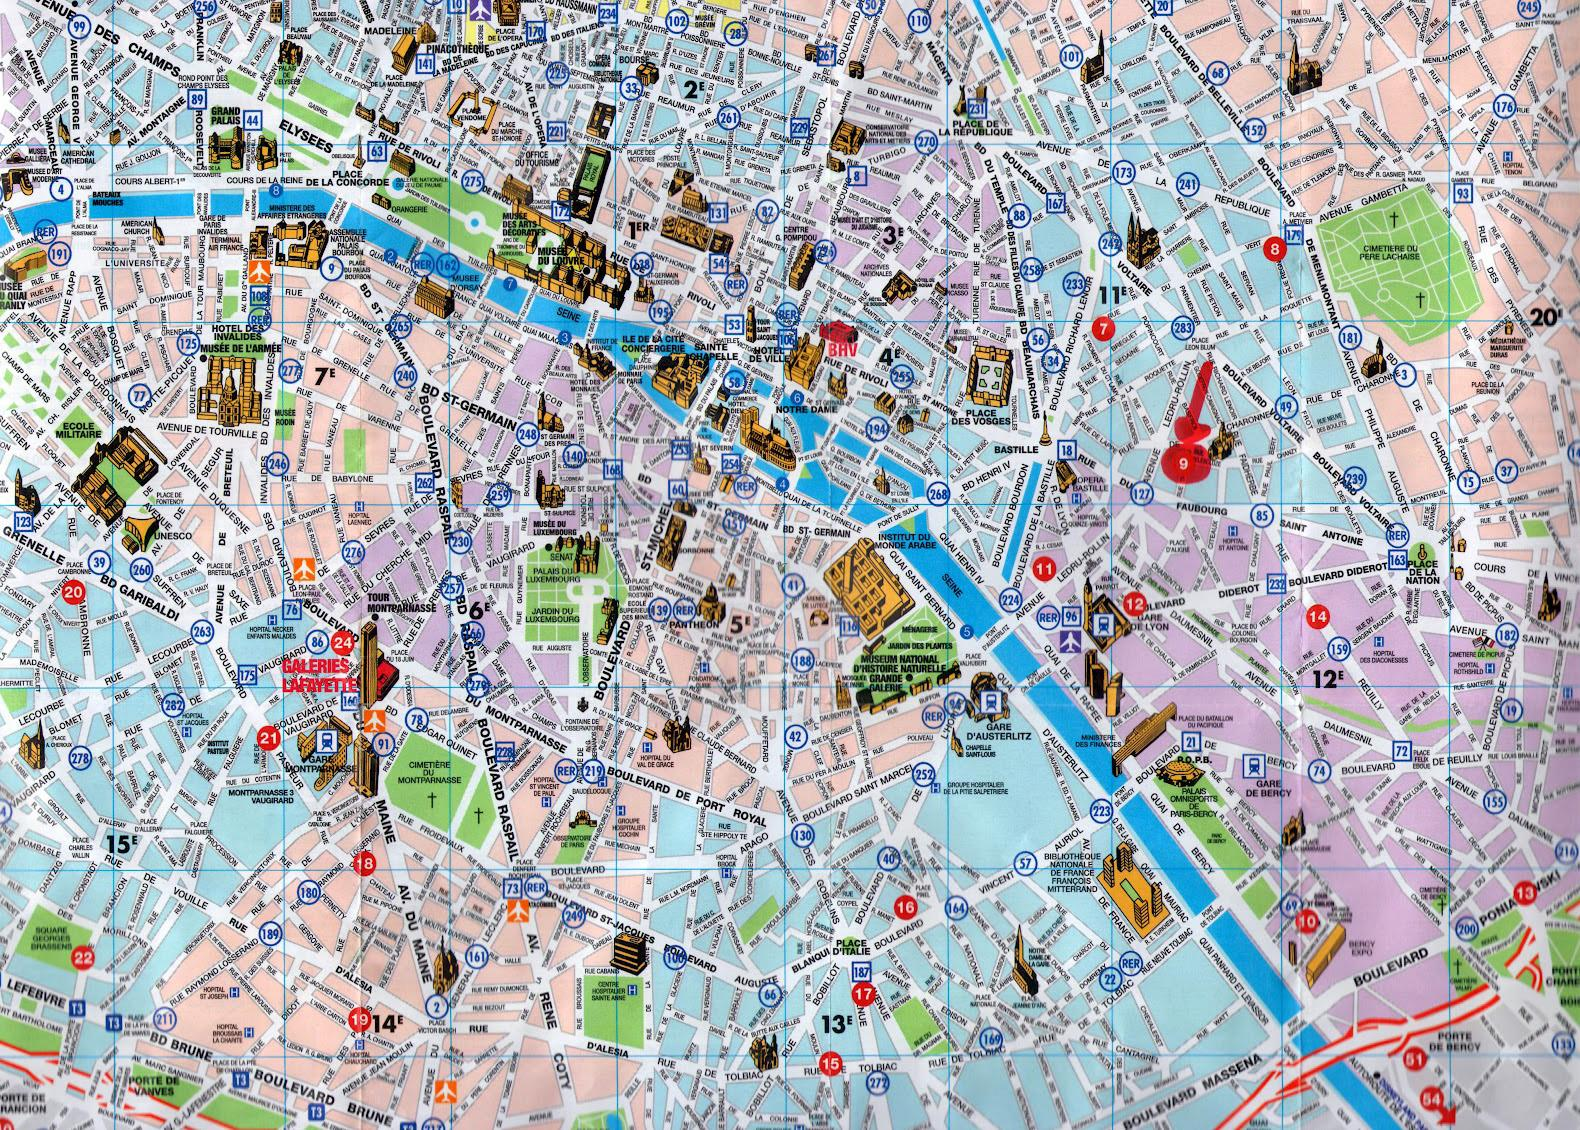 Pariz Mesto Turisticka Mapa Pariz Mapa Mesta S Turistickymi